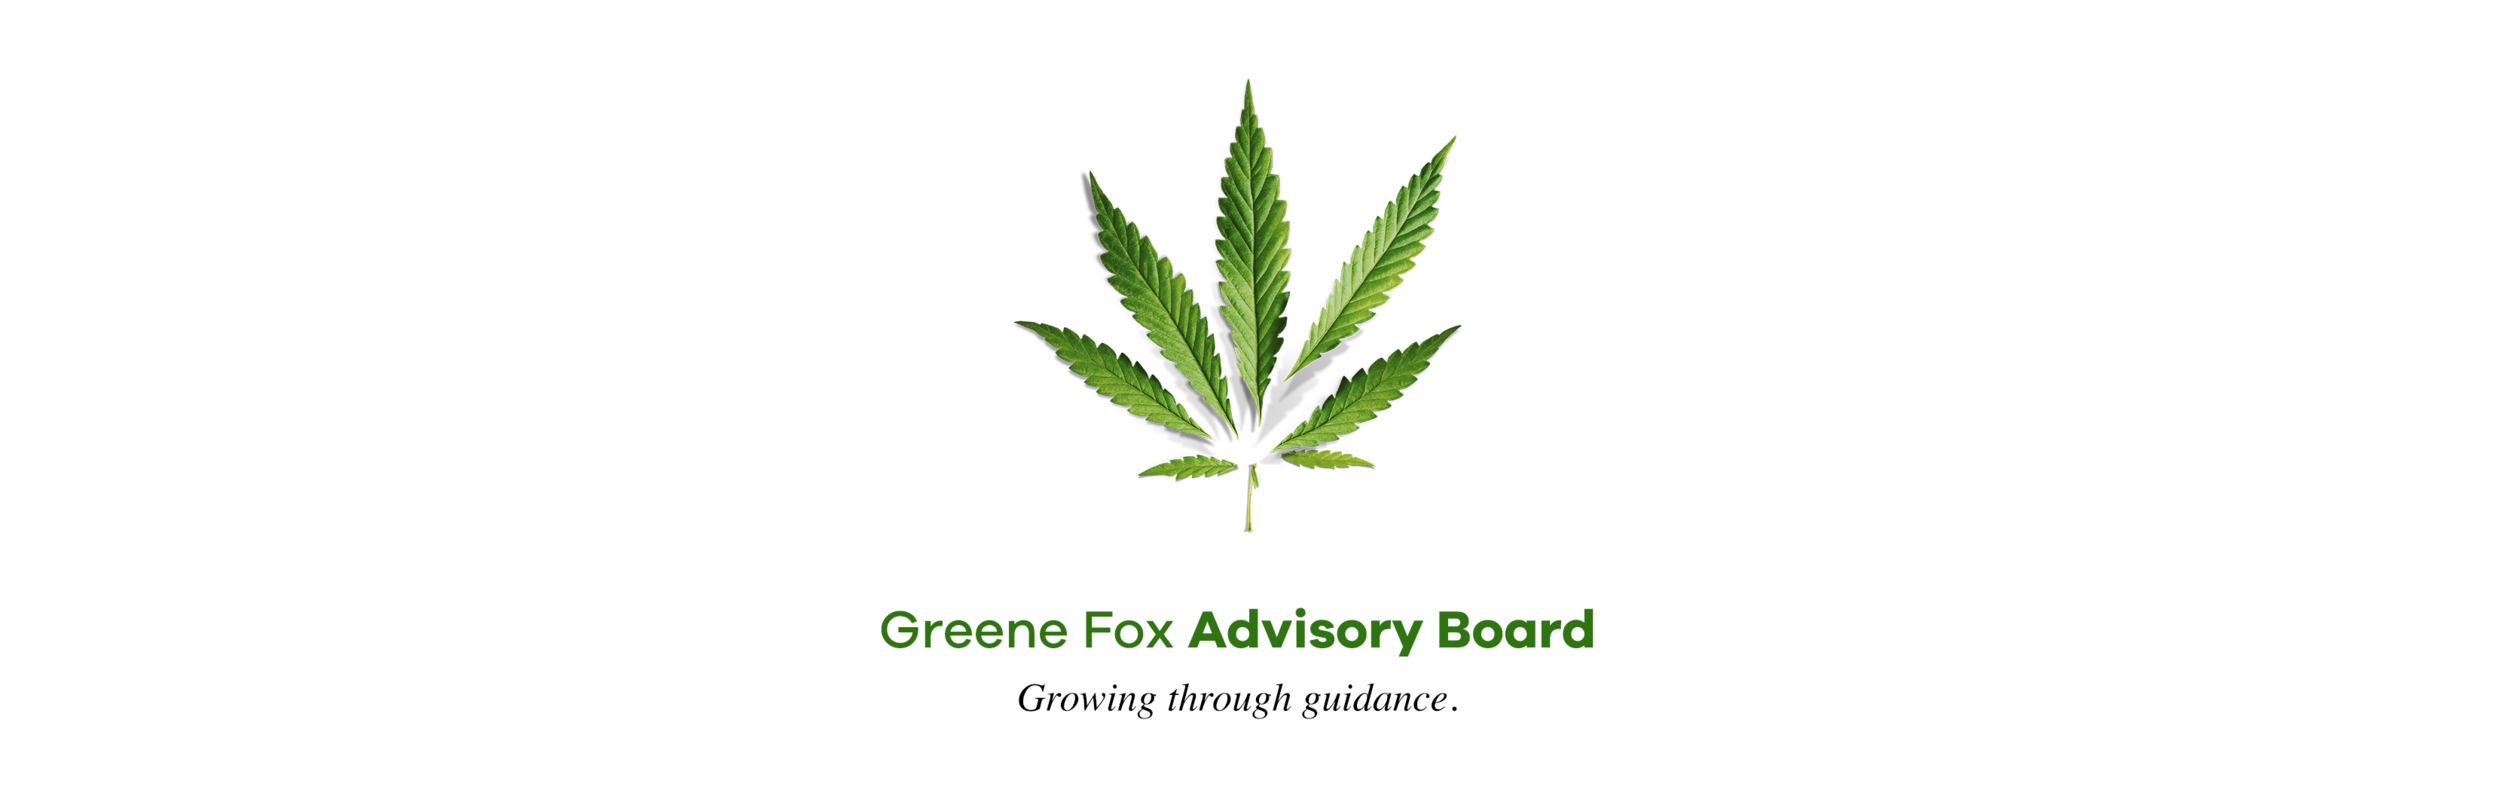 GF Advisor Leaf wide.png